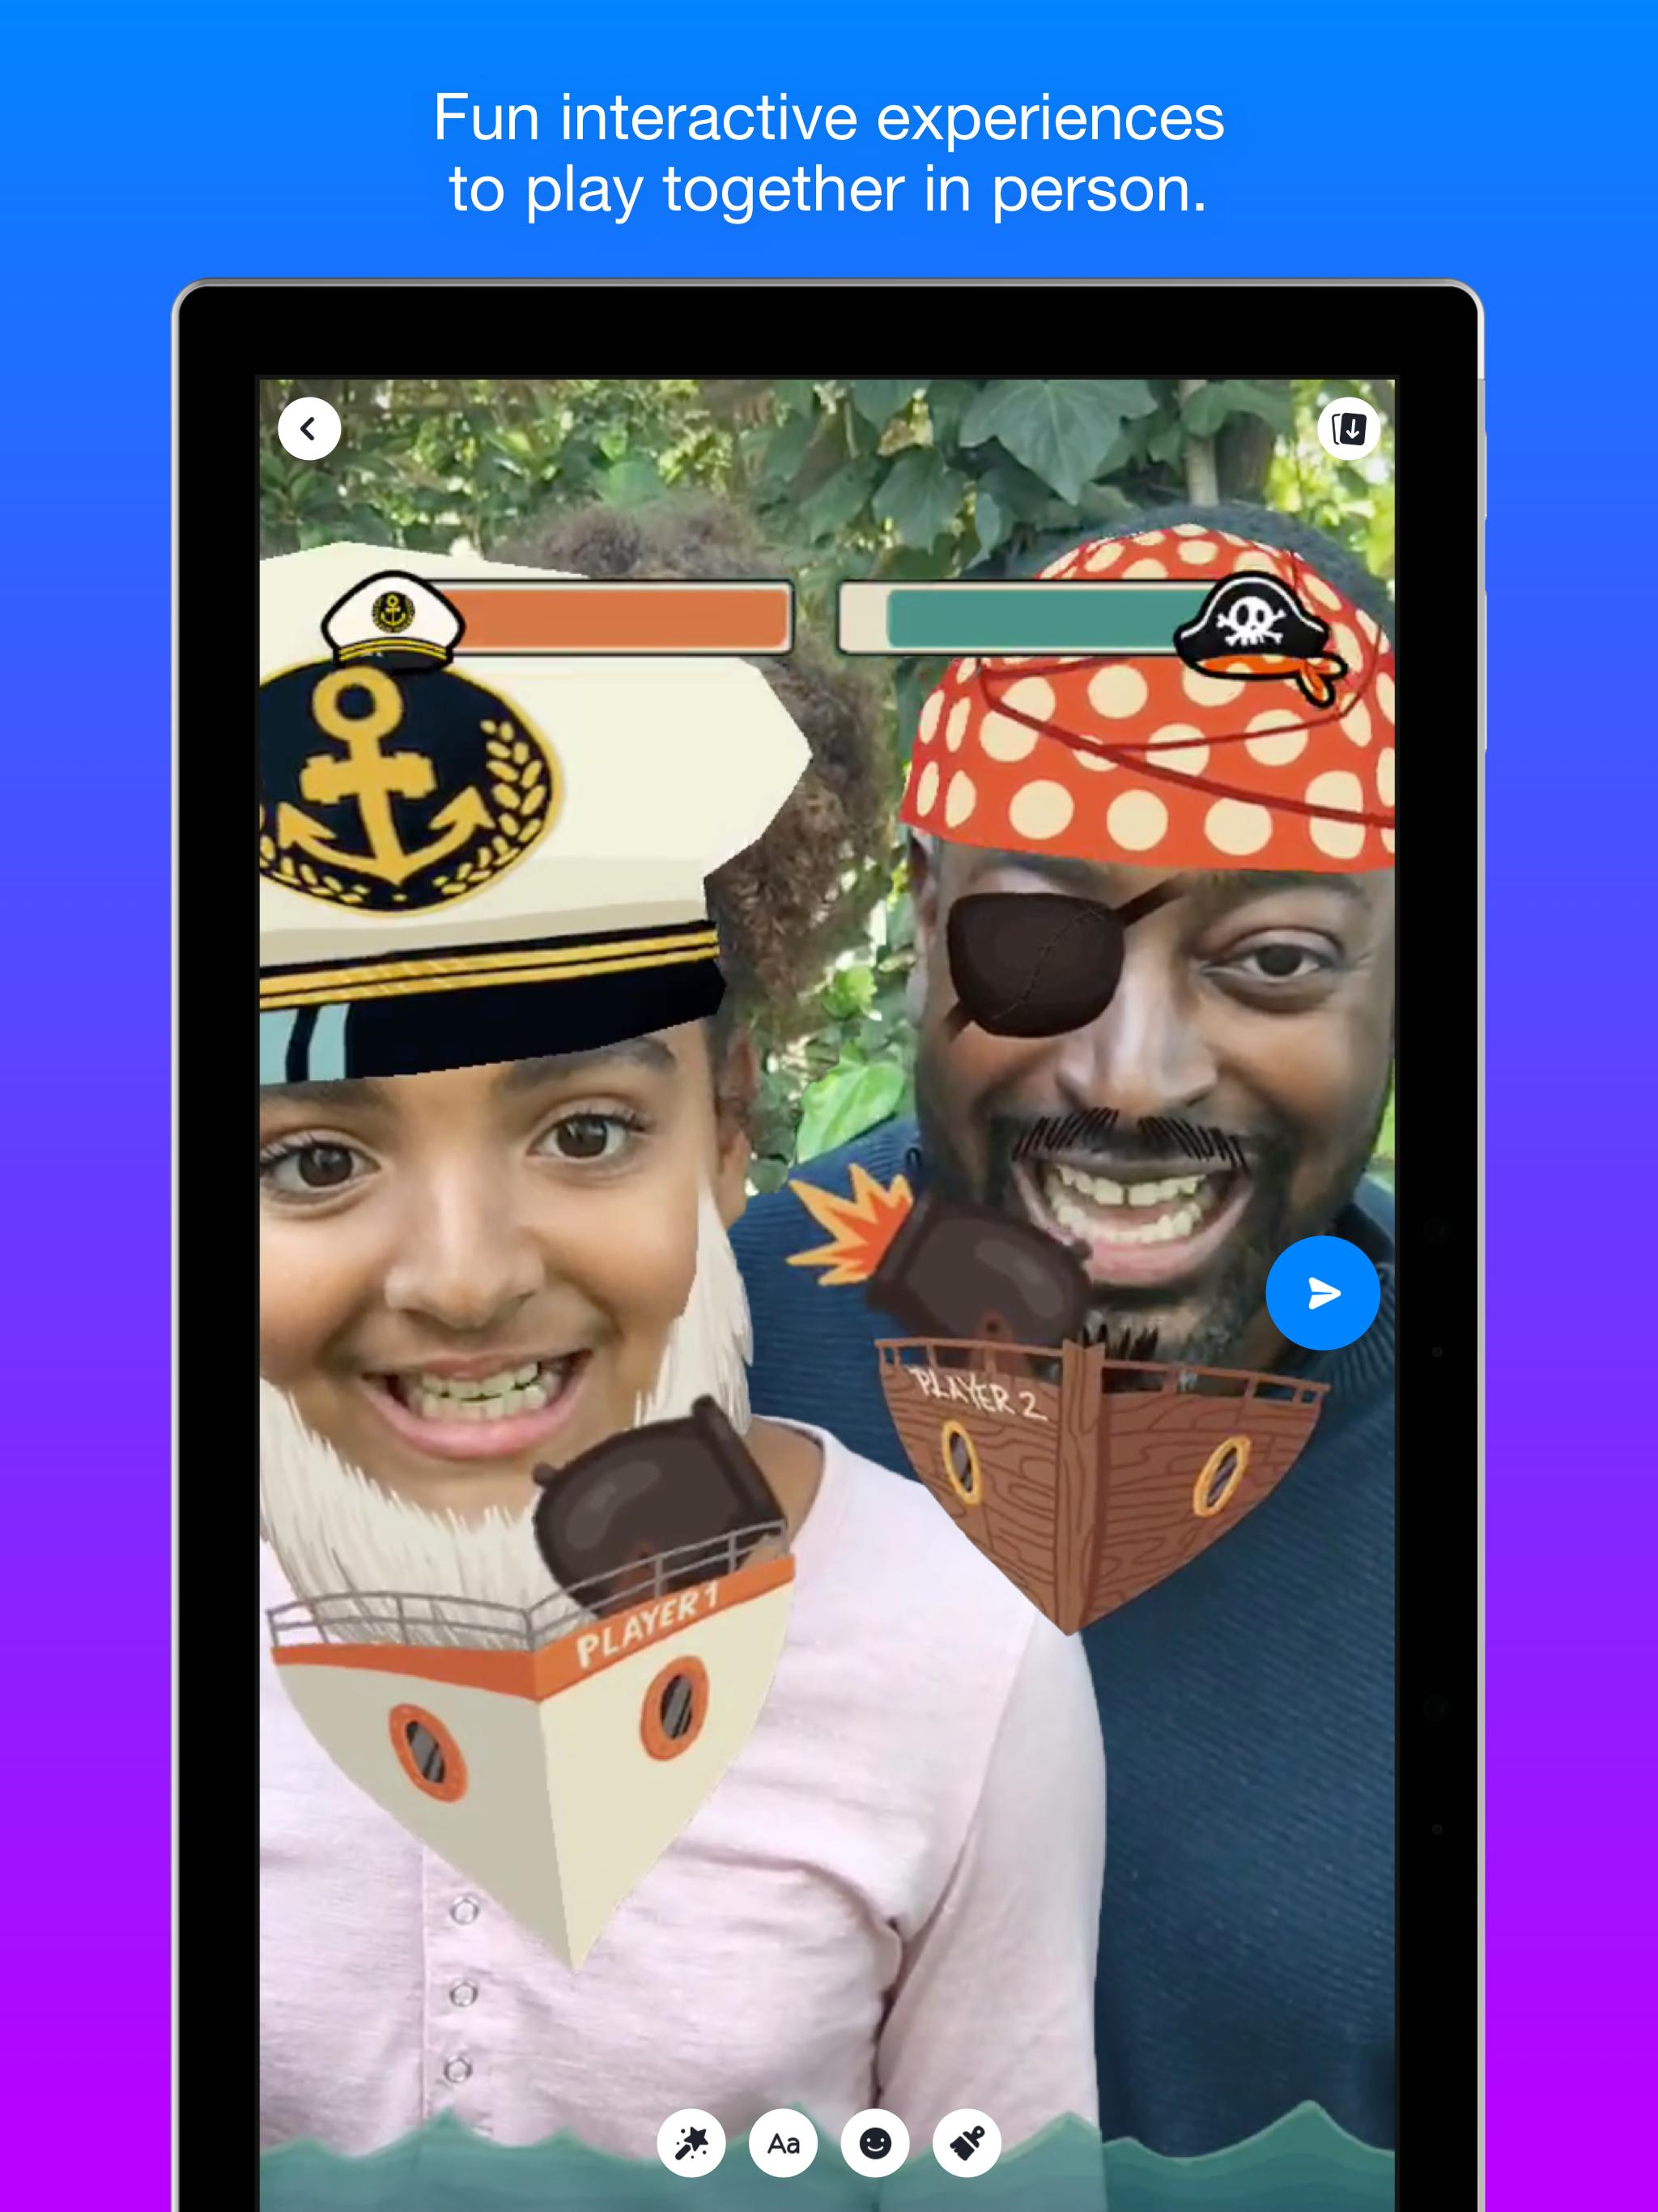 Messenger Kids – Safer Messaging and Video Chat 103.0.0.6.112 Screenshot 15